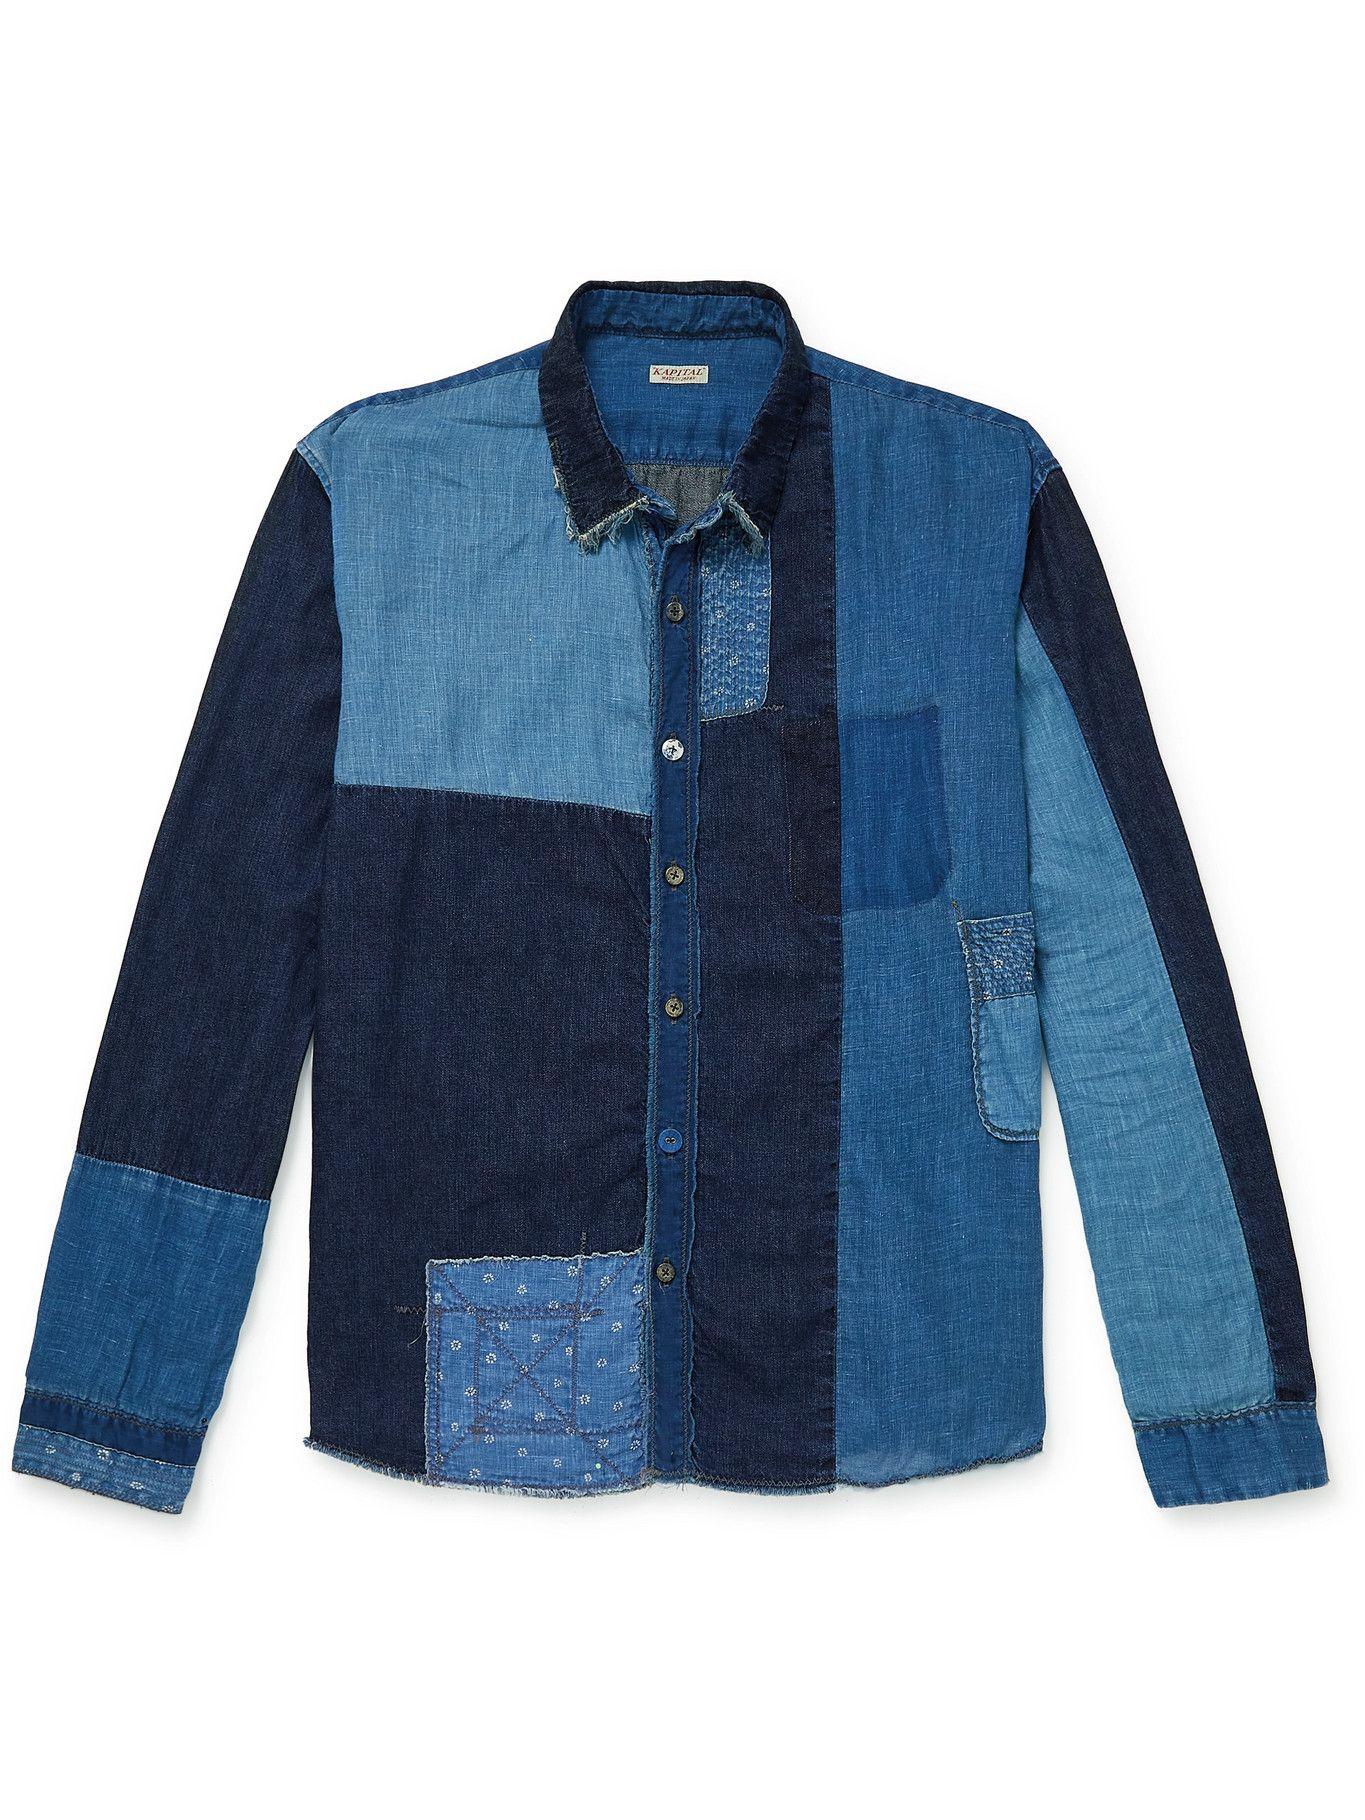 Photo: KAPITAL - Printed Patchwork Cotton and Linen-Blend Chambray Shirt - Blue